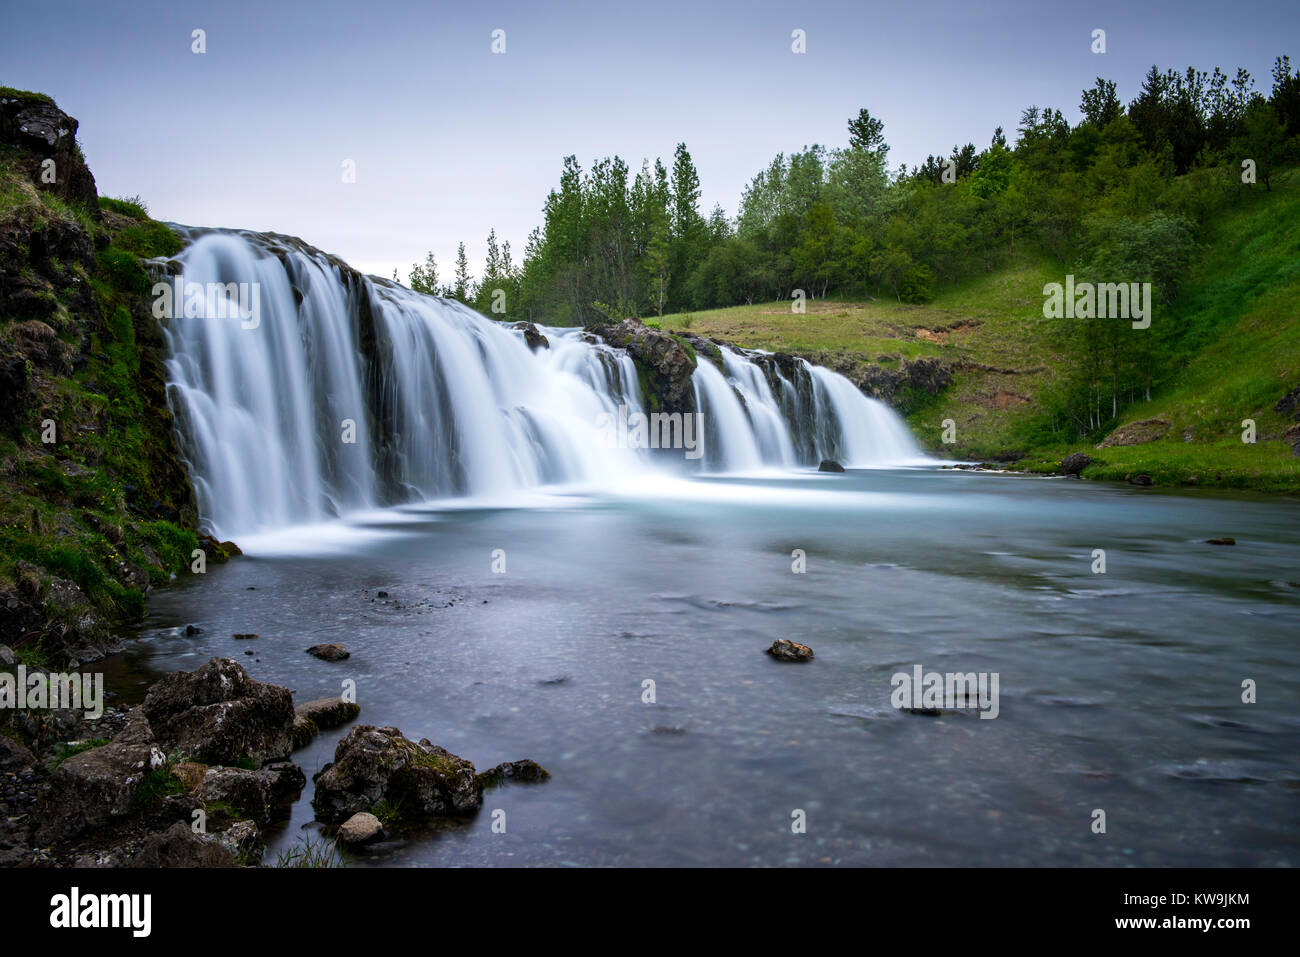 Iceland Waterfall Stock Photo